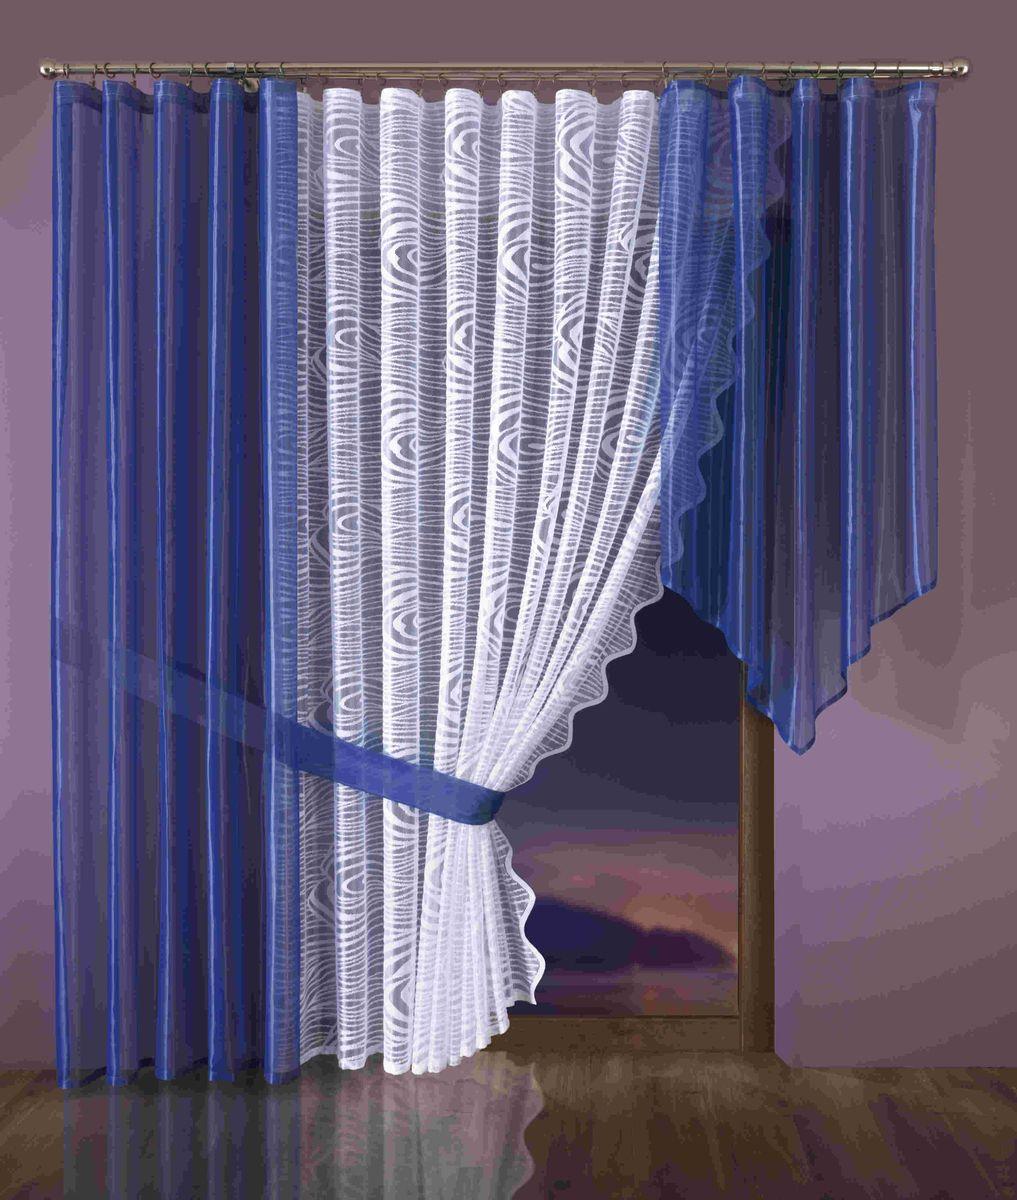 Комплект штор Wisan Klaudyna, на ленте, цвет: белый, синий, высота 250 см комплект штор wisan lara на ленте цвет оранжевый белый высота 250 см